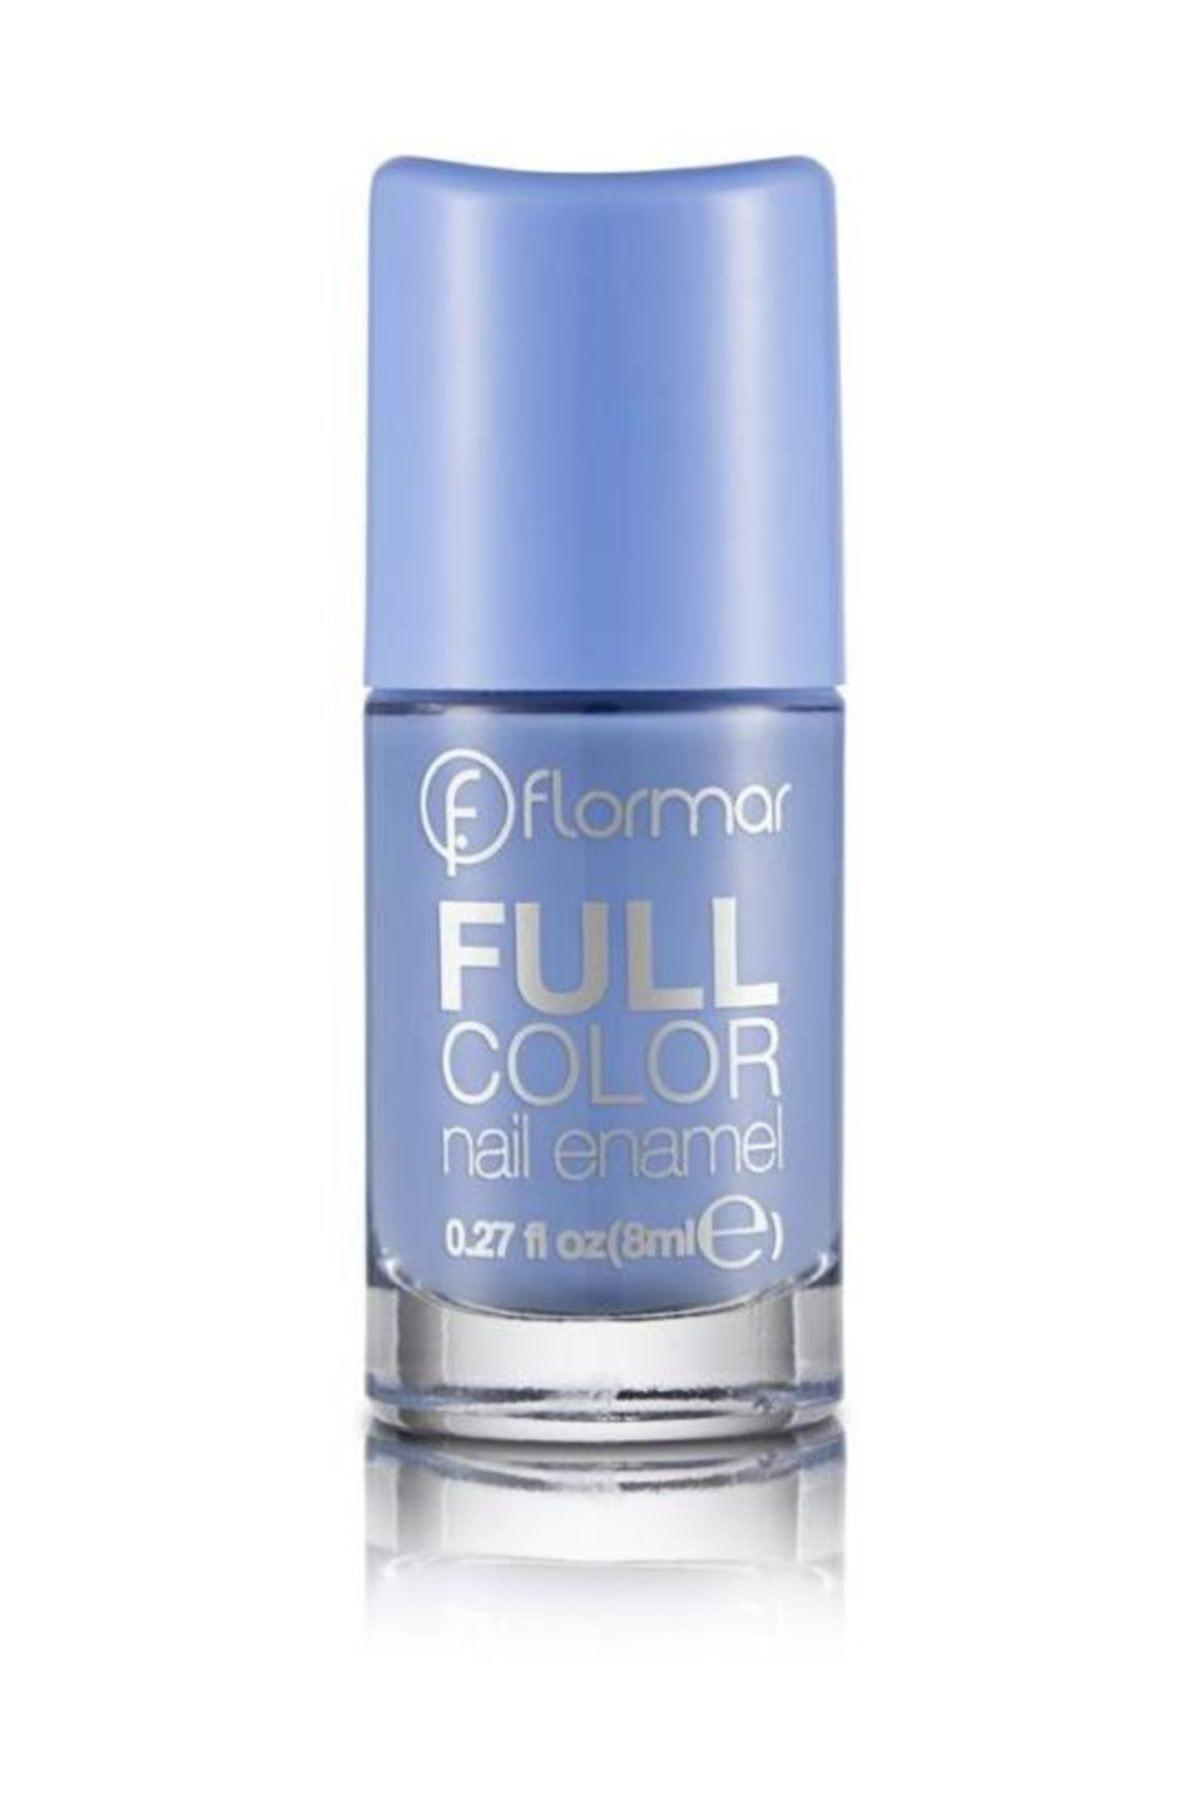 Flormar  Full Color Nail Enamel  FC16 Imaginary World